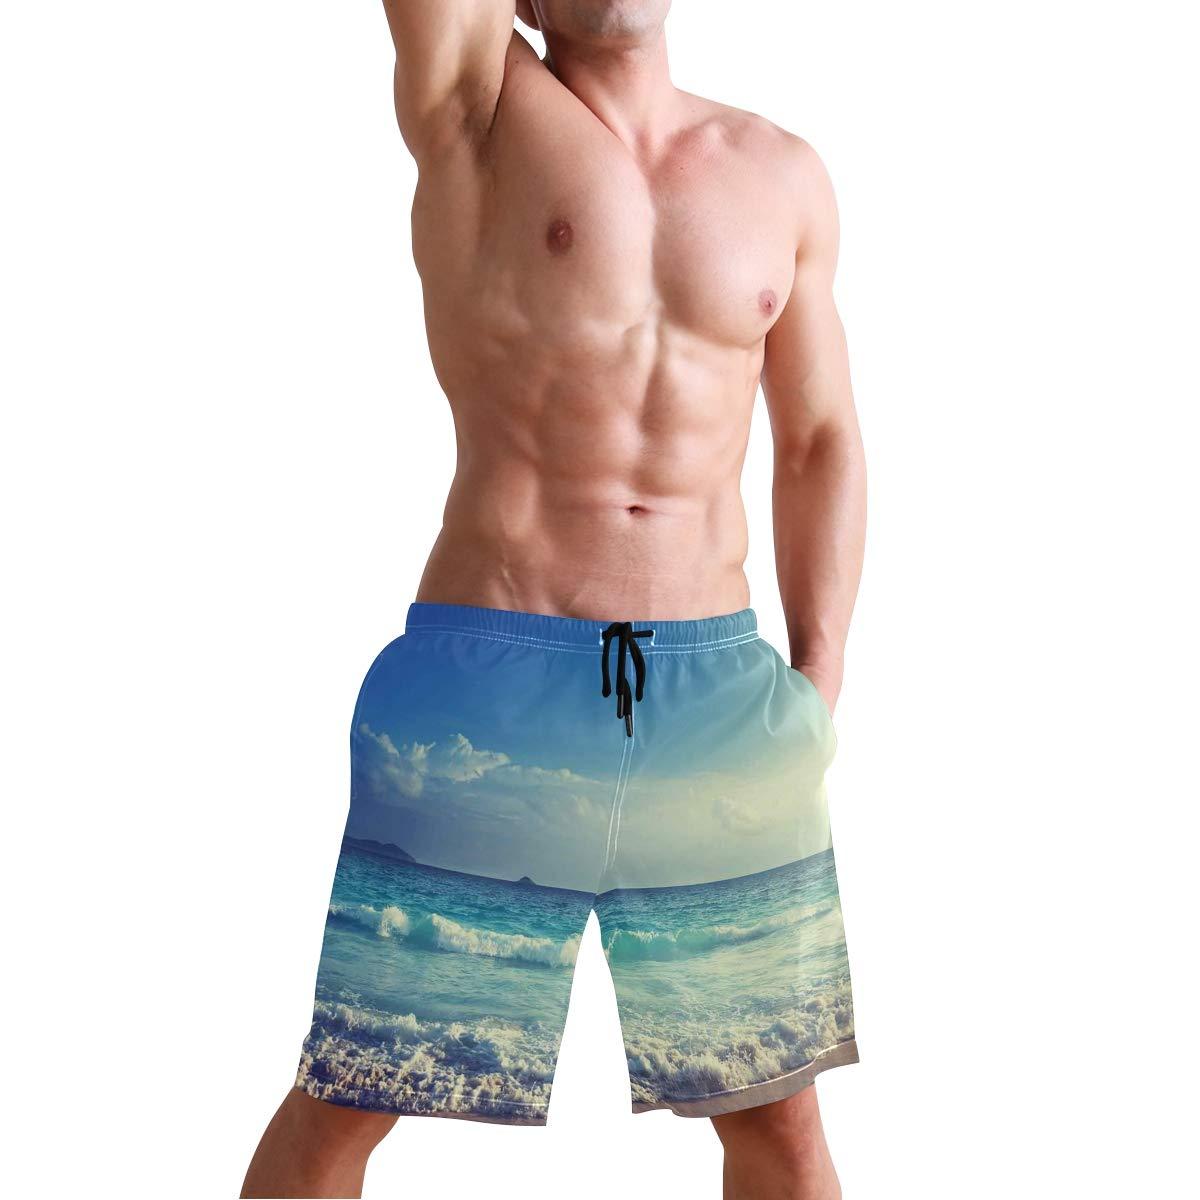 KVMV Tropical Hawaii Hibiscus Surfing Girl Silhouette Surfboard Retro Themed Quick Dry Beach Shorts